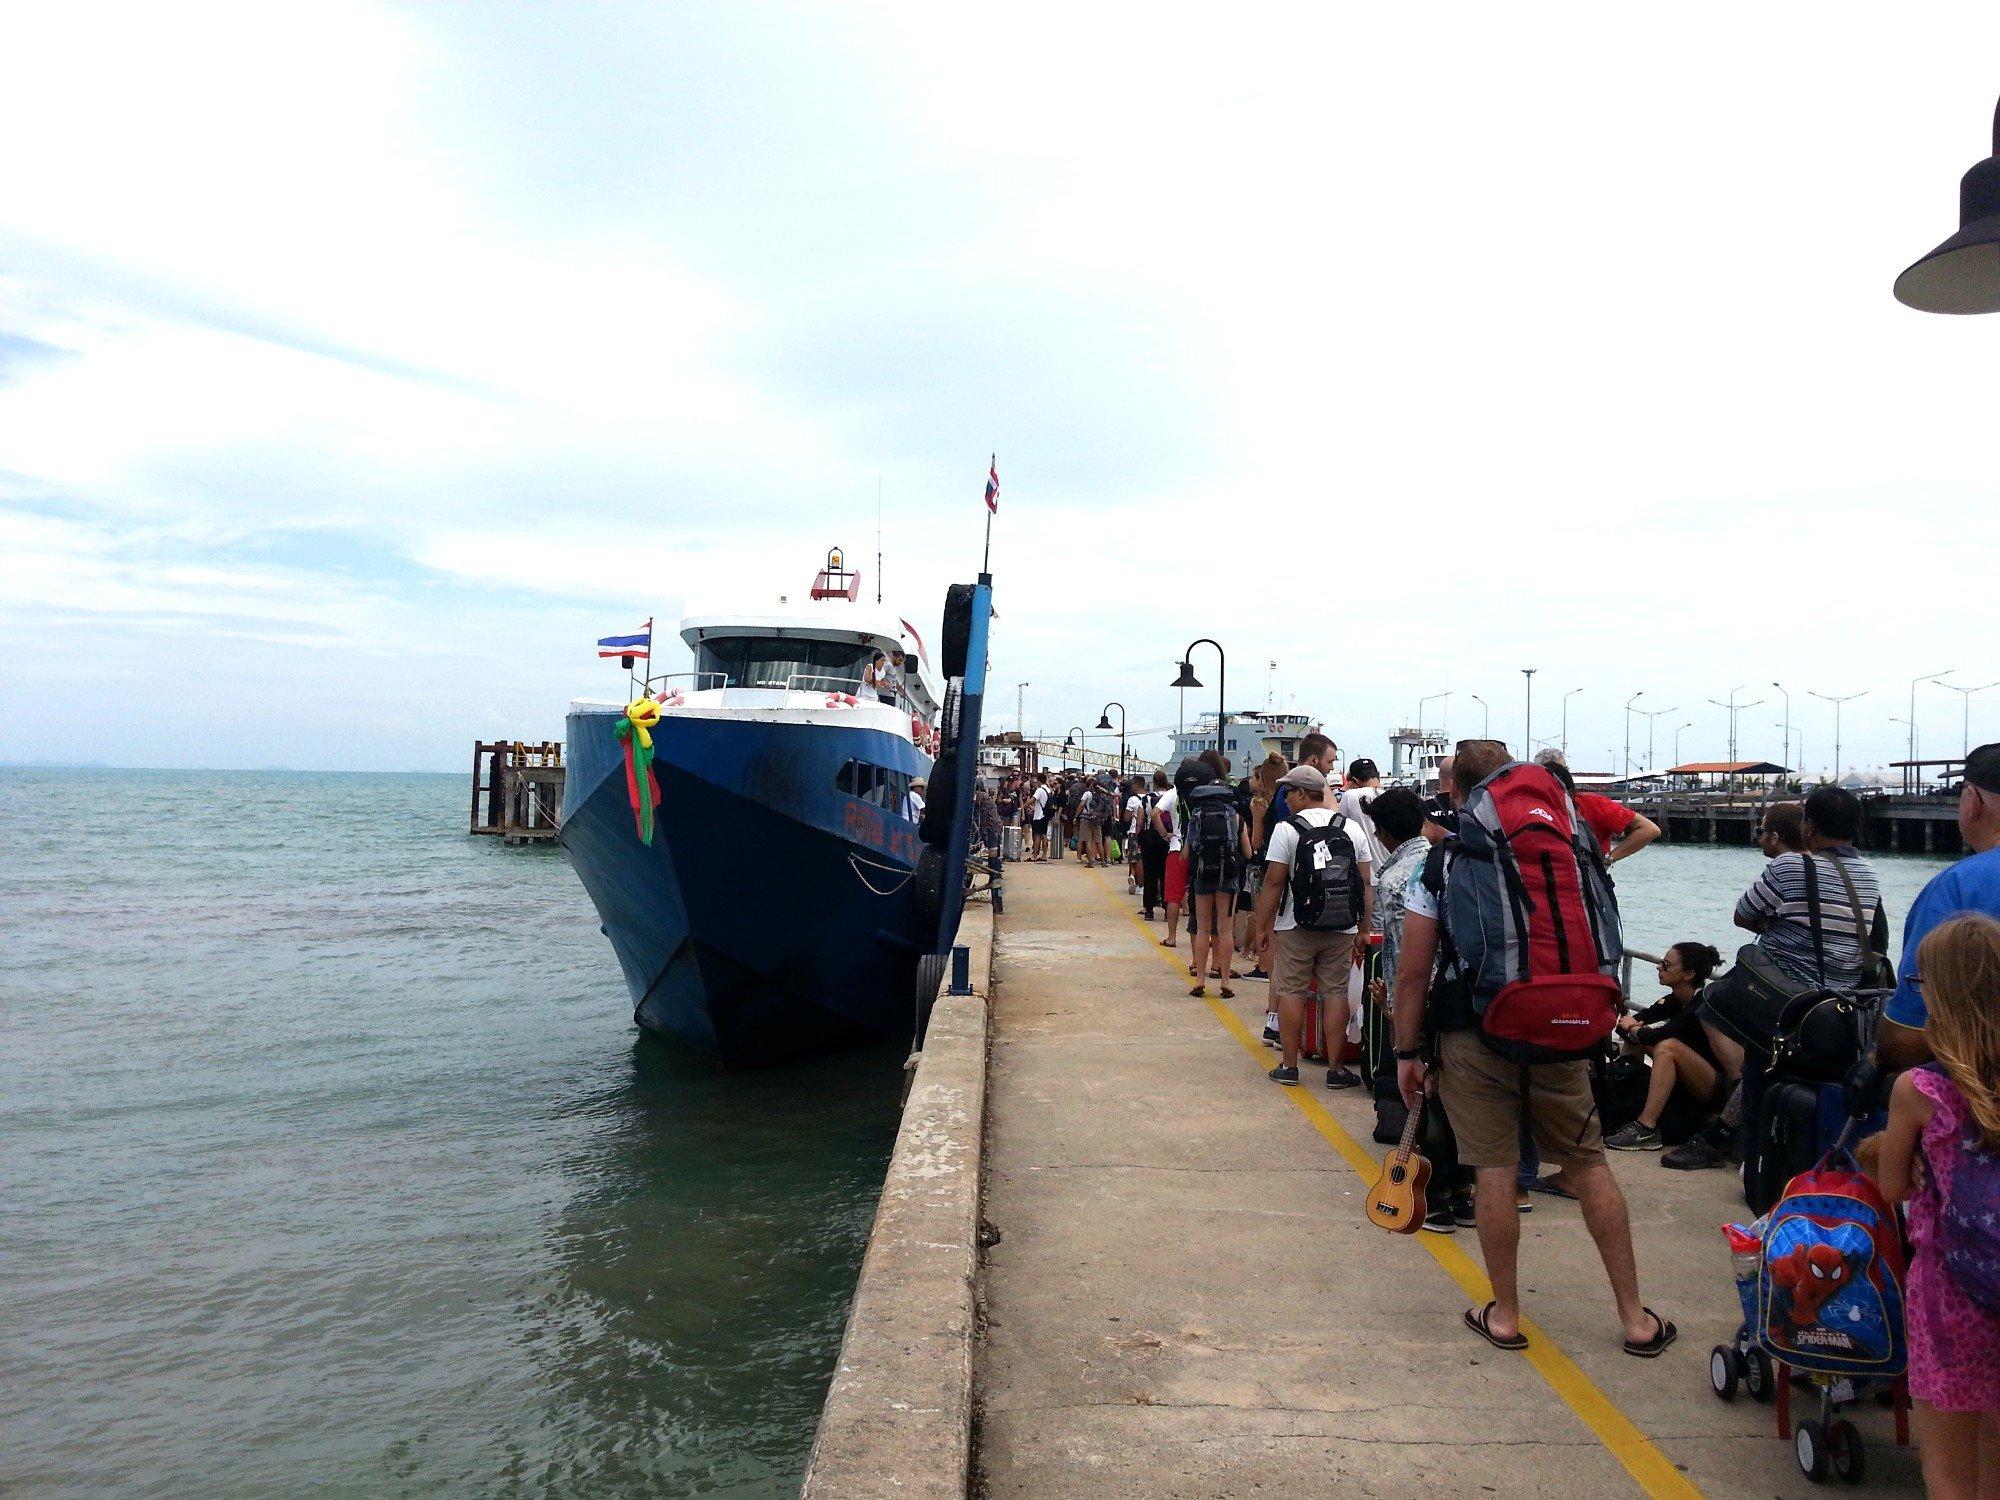 Na Thon Ferry Pier in Koh Samui